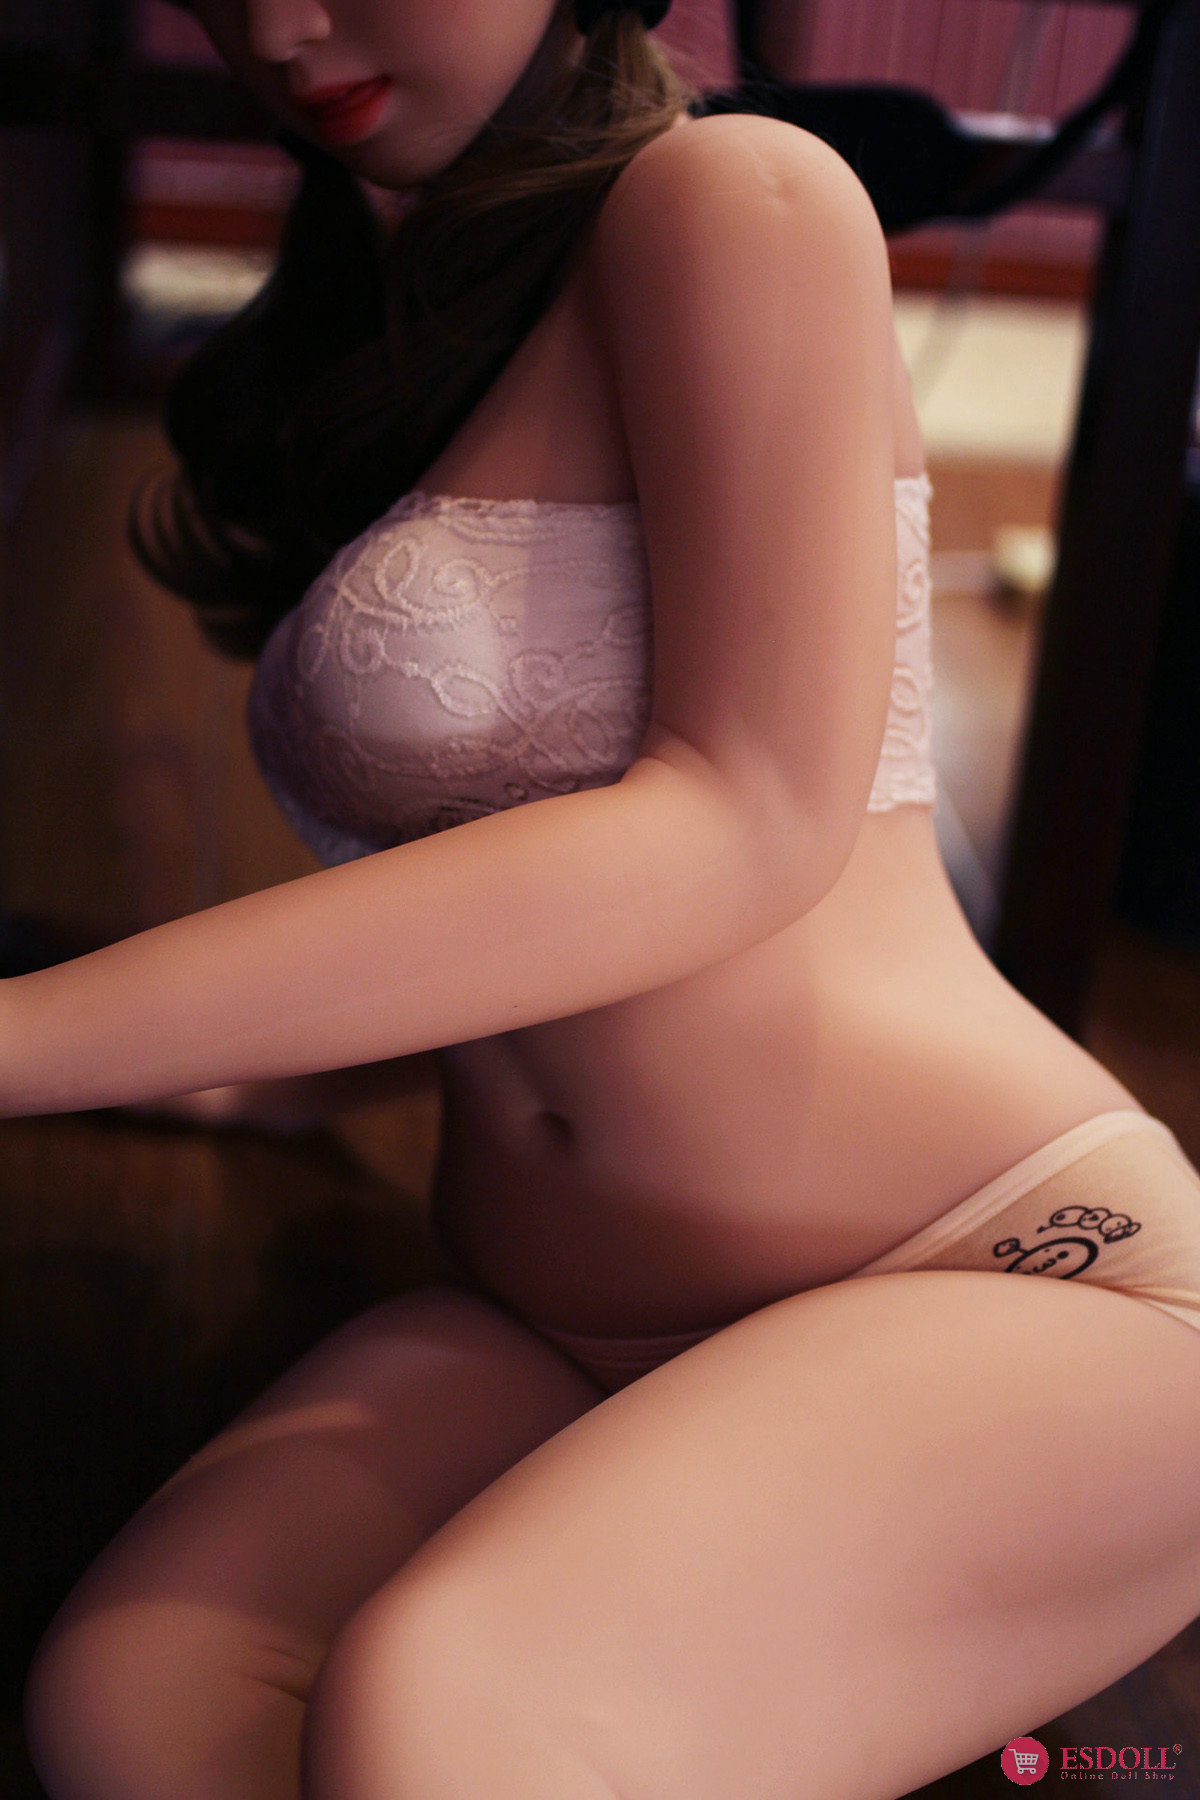 153cm Niki sex doll - 14